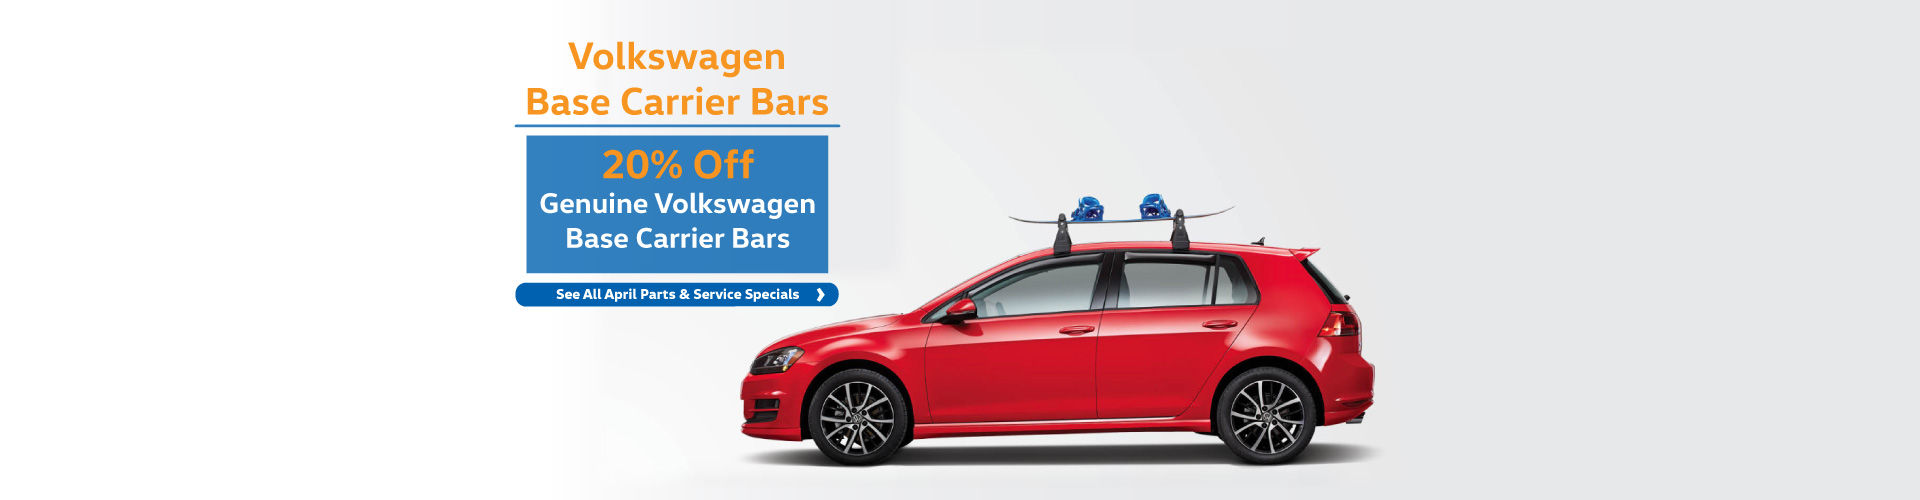 Base Carrier Bars Special Offer